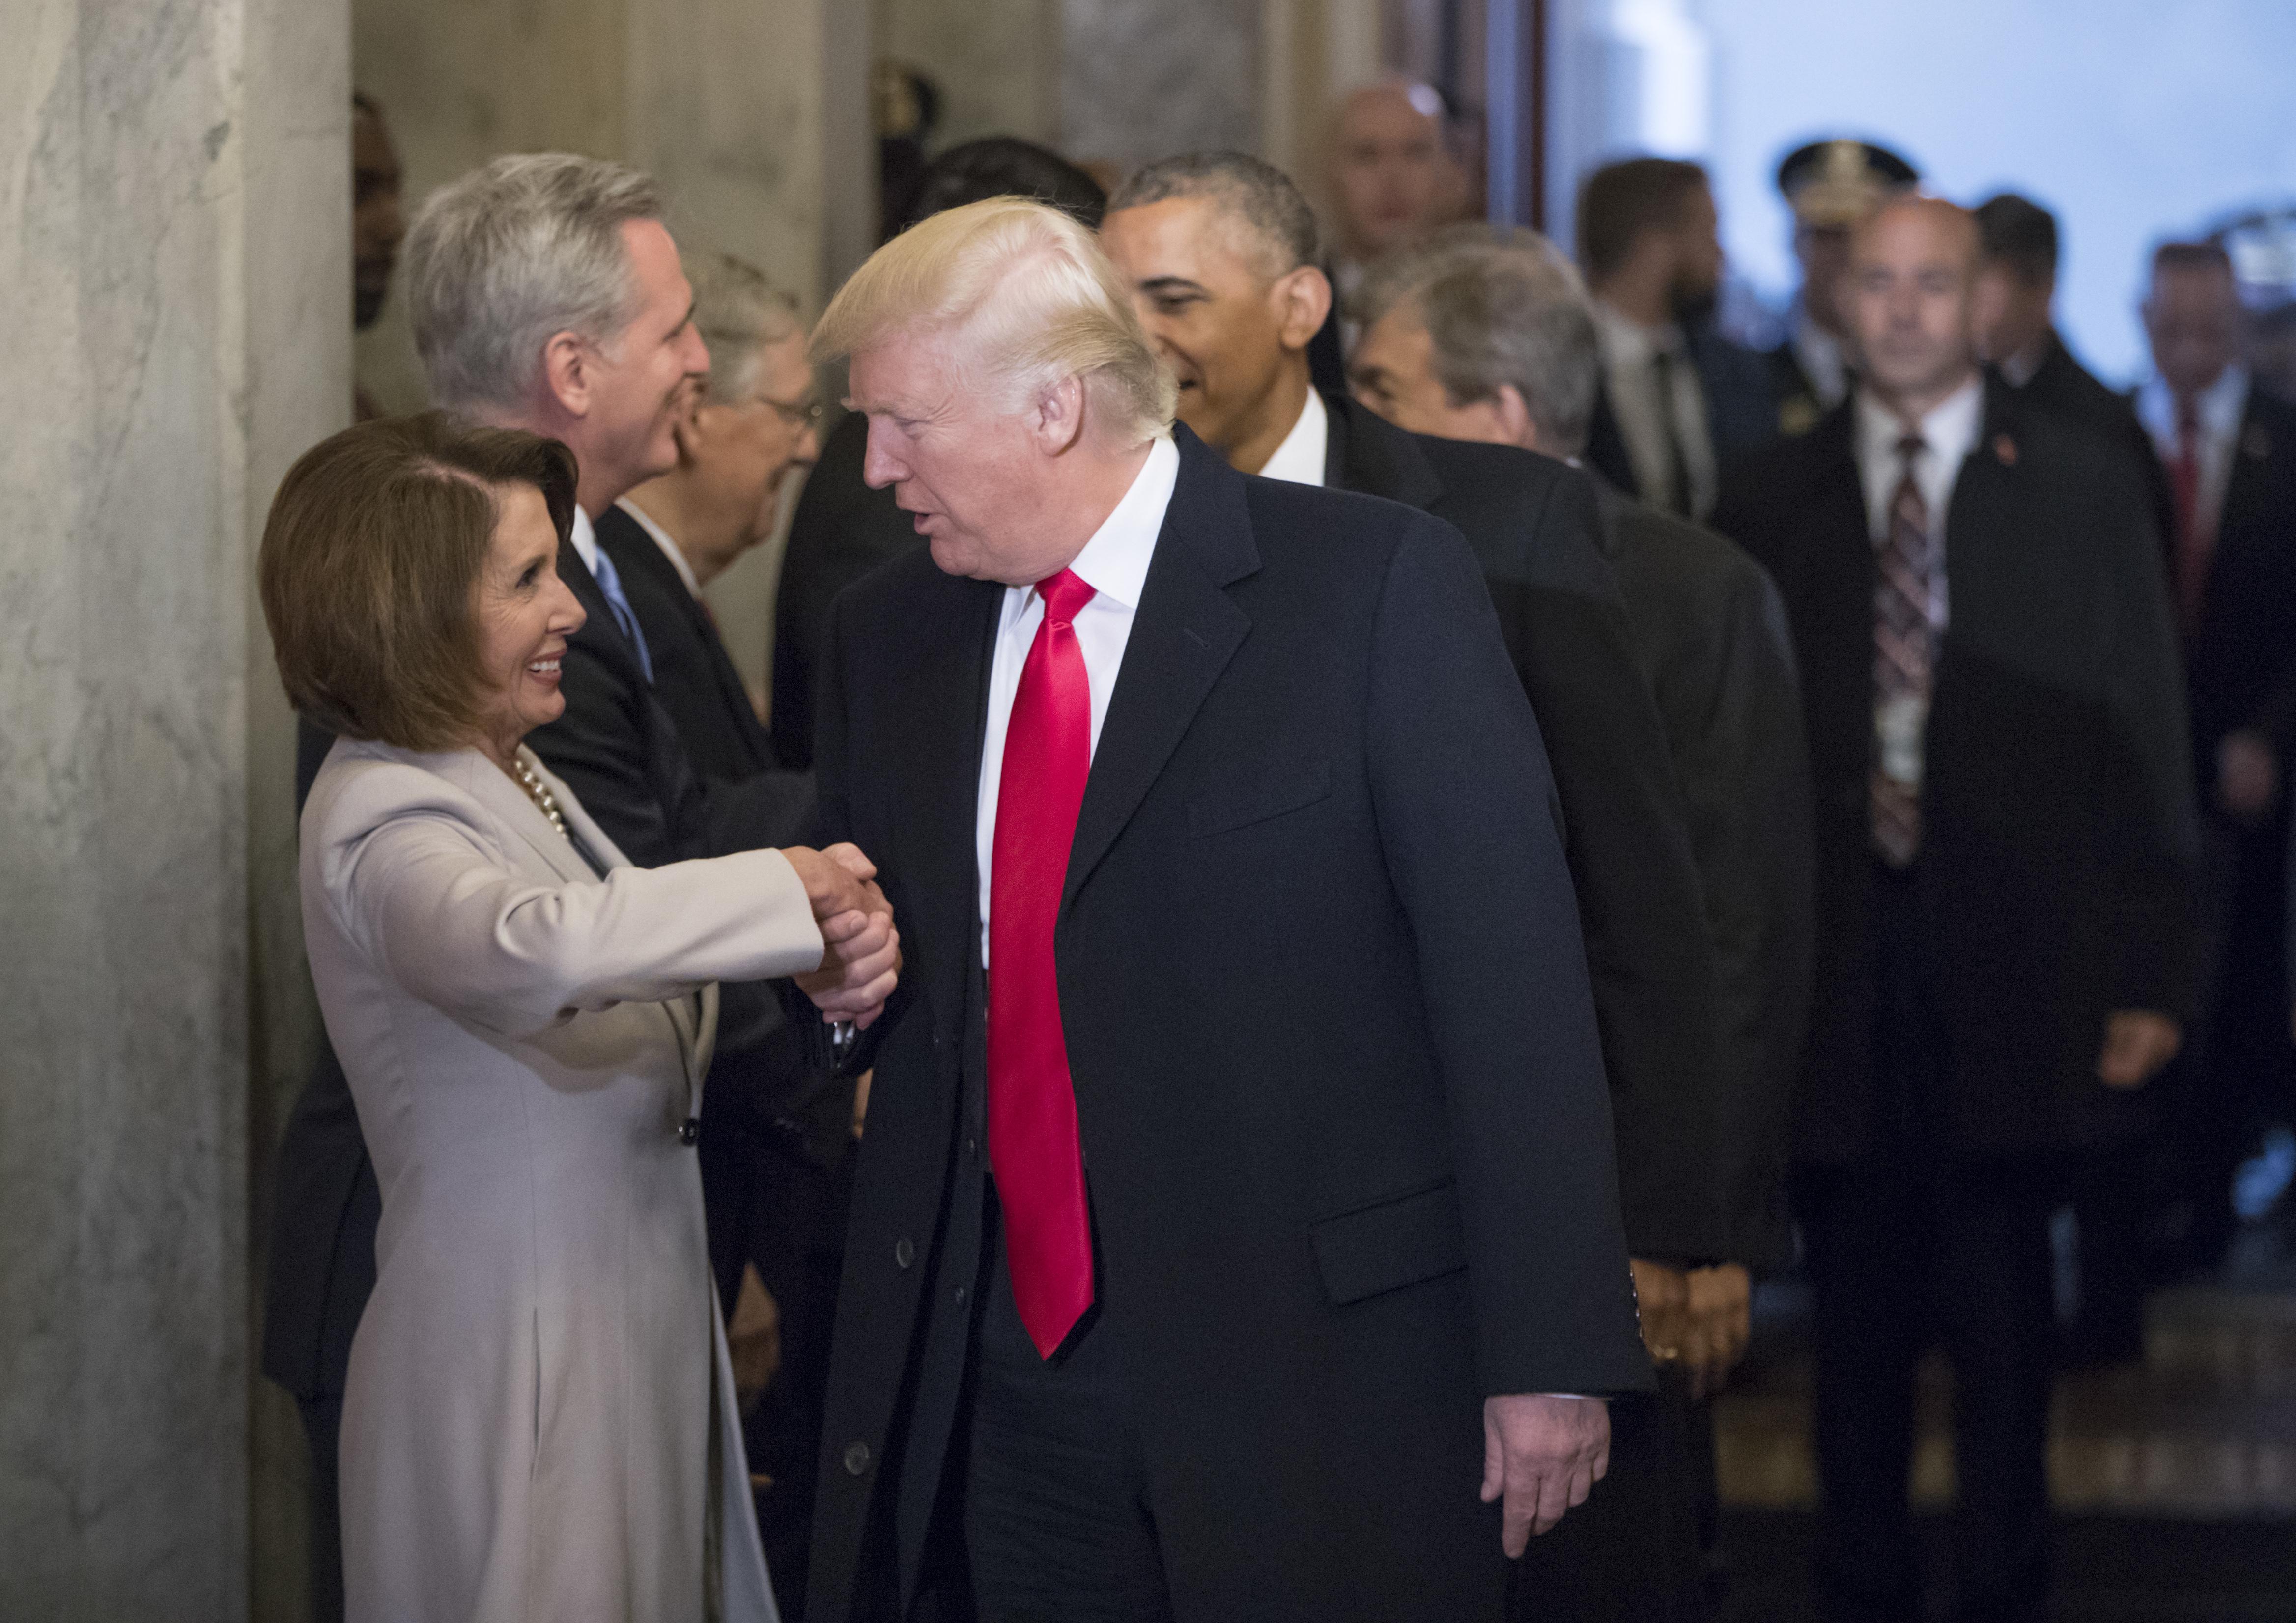 Donald Trump Endorses Nancy Pelosi For Speaker Of The House